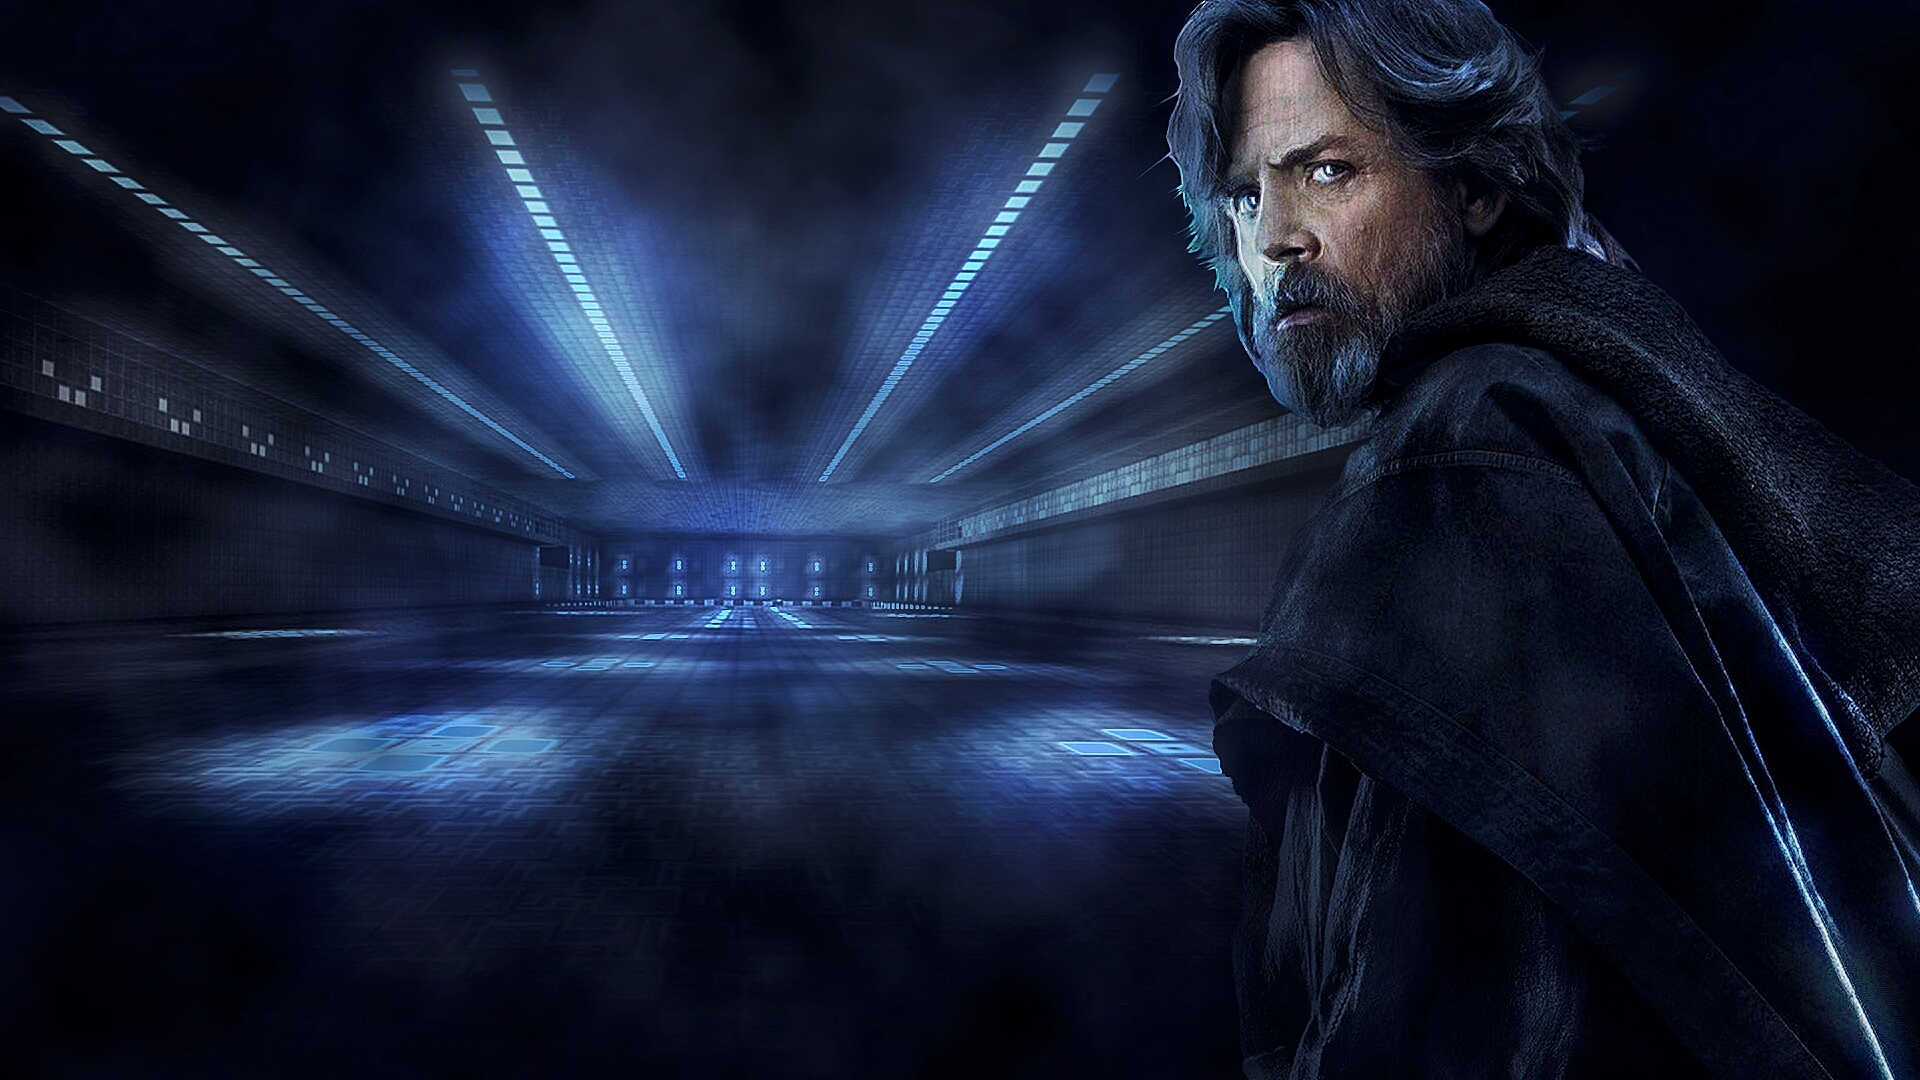 Wallpaper Luke Skywalker Star Wars By Wribeiro On Deviantart